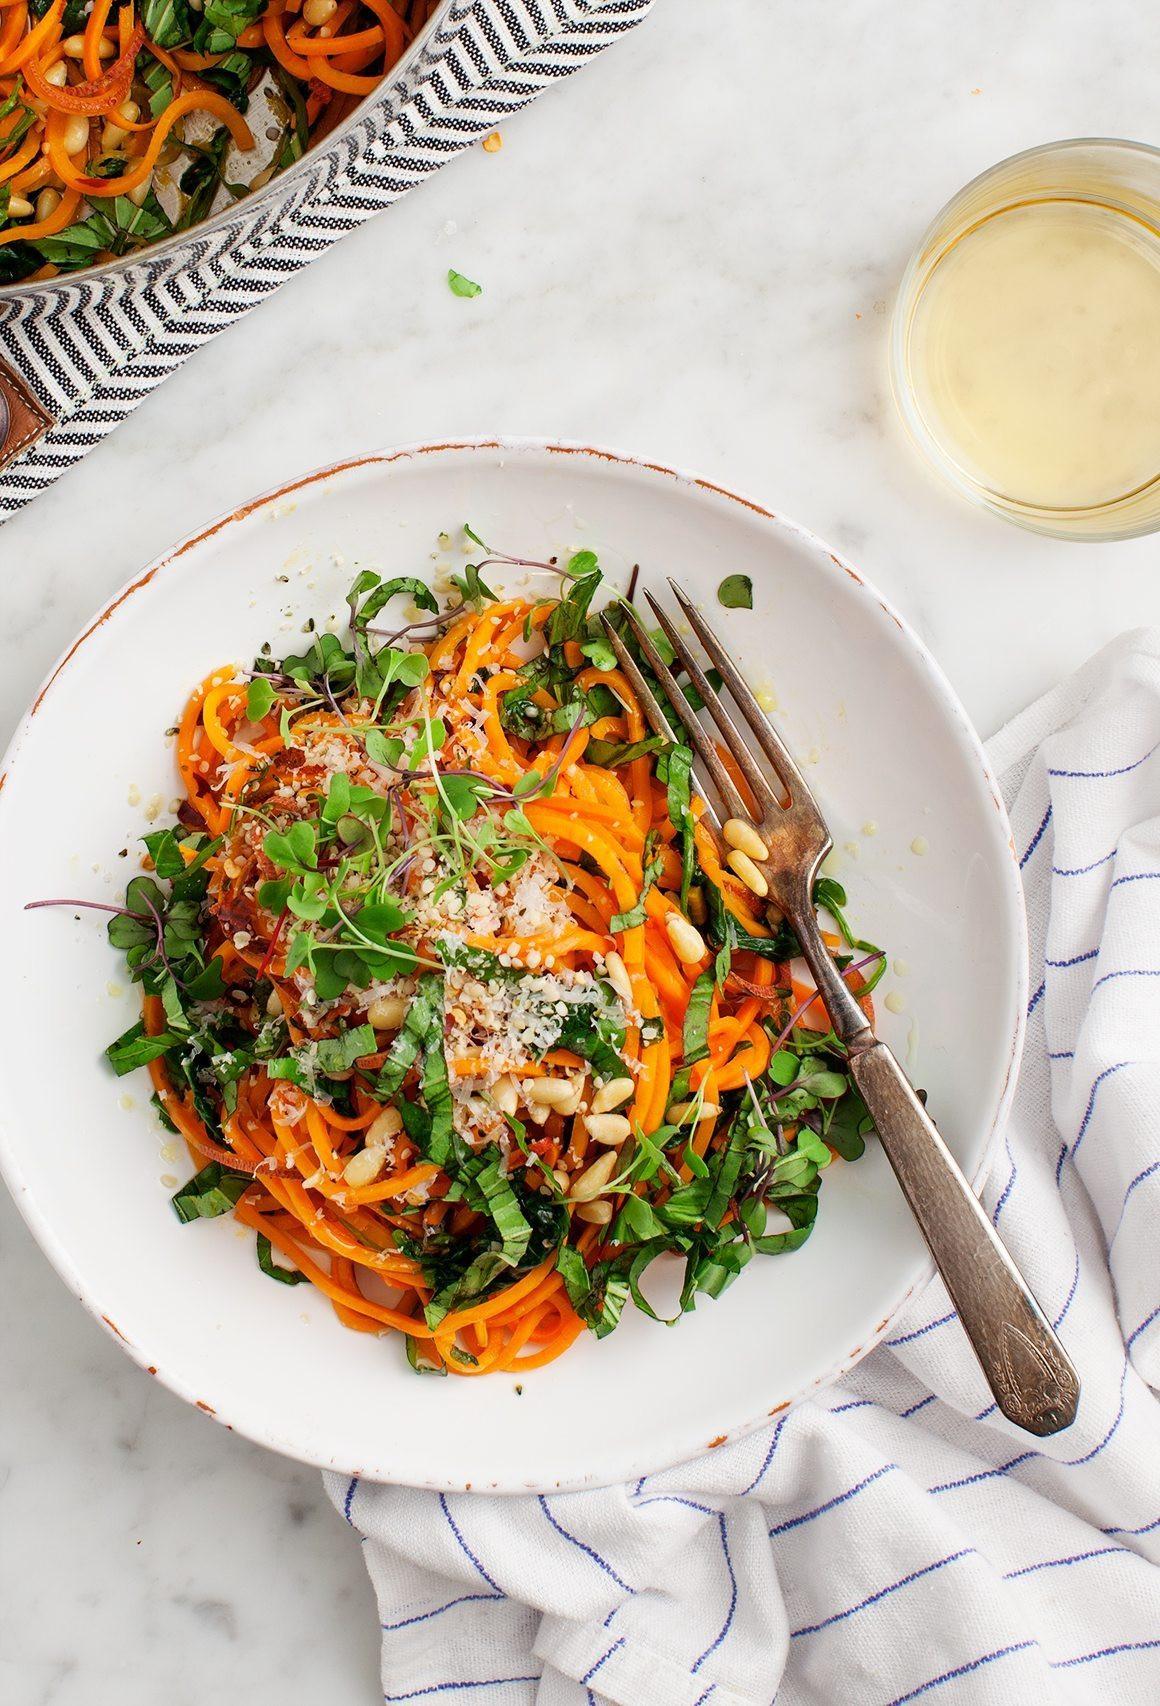 Healthy Vegetarian Dinner Recipes  Healthy Ve arian Dinner Recipes Love and Lemons